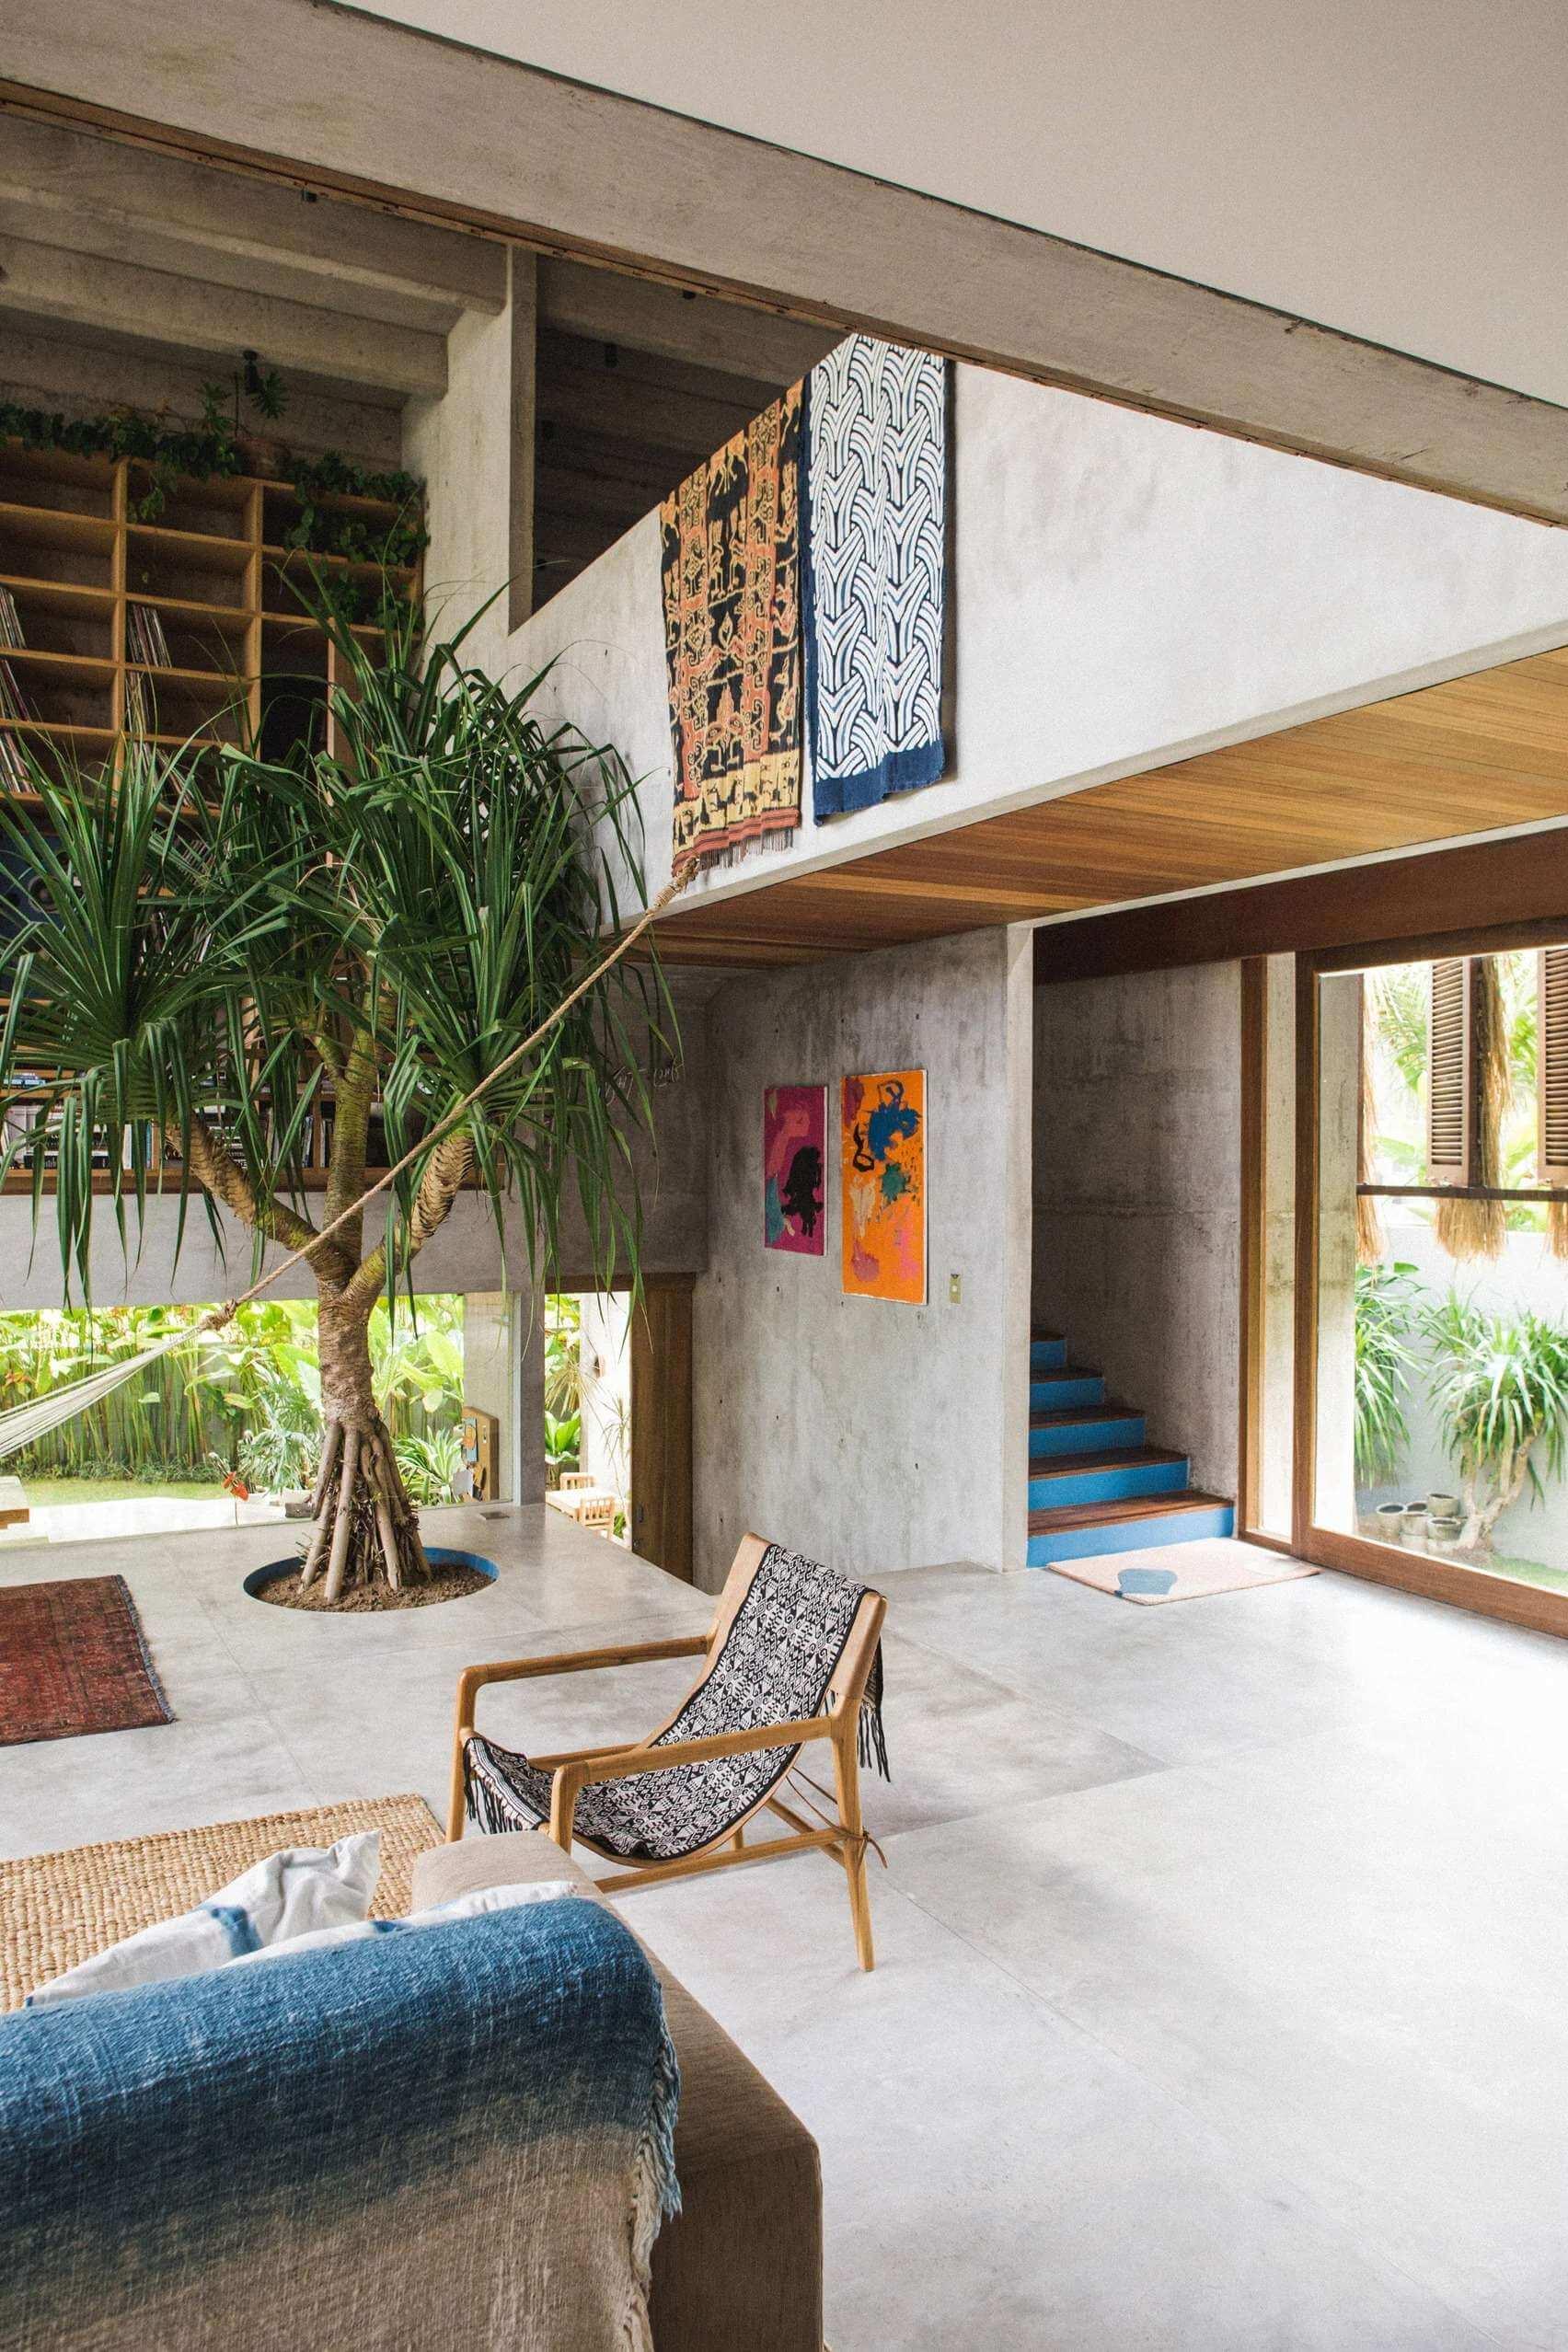 a-brutalist-tropical-home-in-bali-patisandhika-daniel-mitchell-indonesia-concrete-house-architecture_dezeen_1704_col_33_11zon